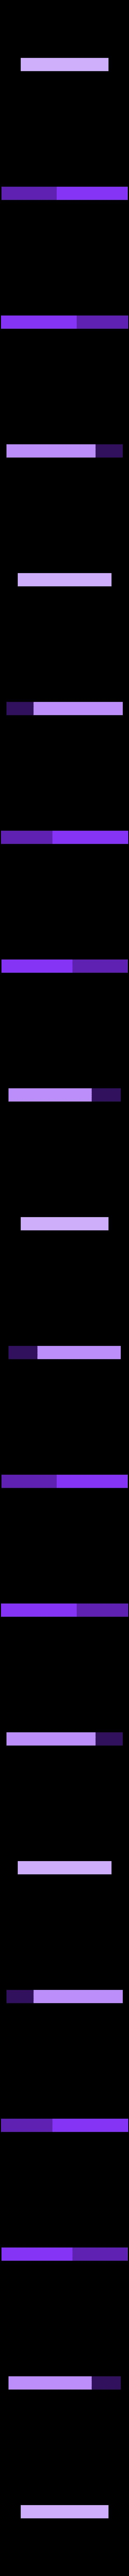 Raspberry_Pi_3B%2B_Sleeve.Raspberry_Pi_3B..Body2.stl Télécharger fichier STL gratuit Raspberry Pi 3B+ Sleeve • Design à imprimer en 3D, Wilko